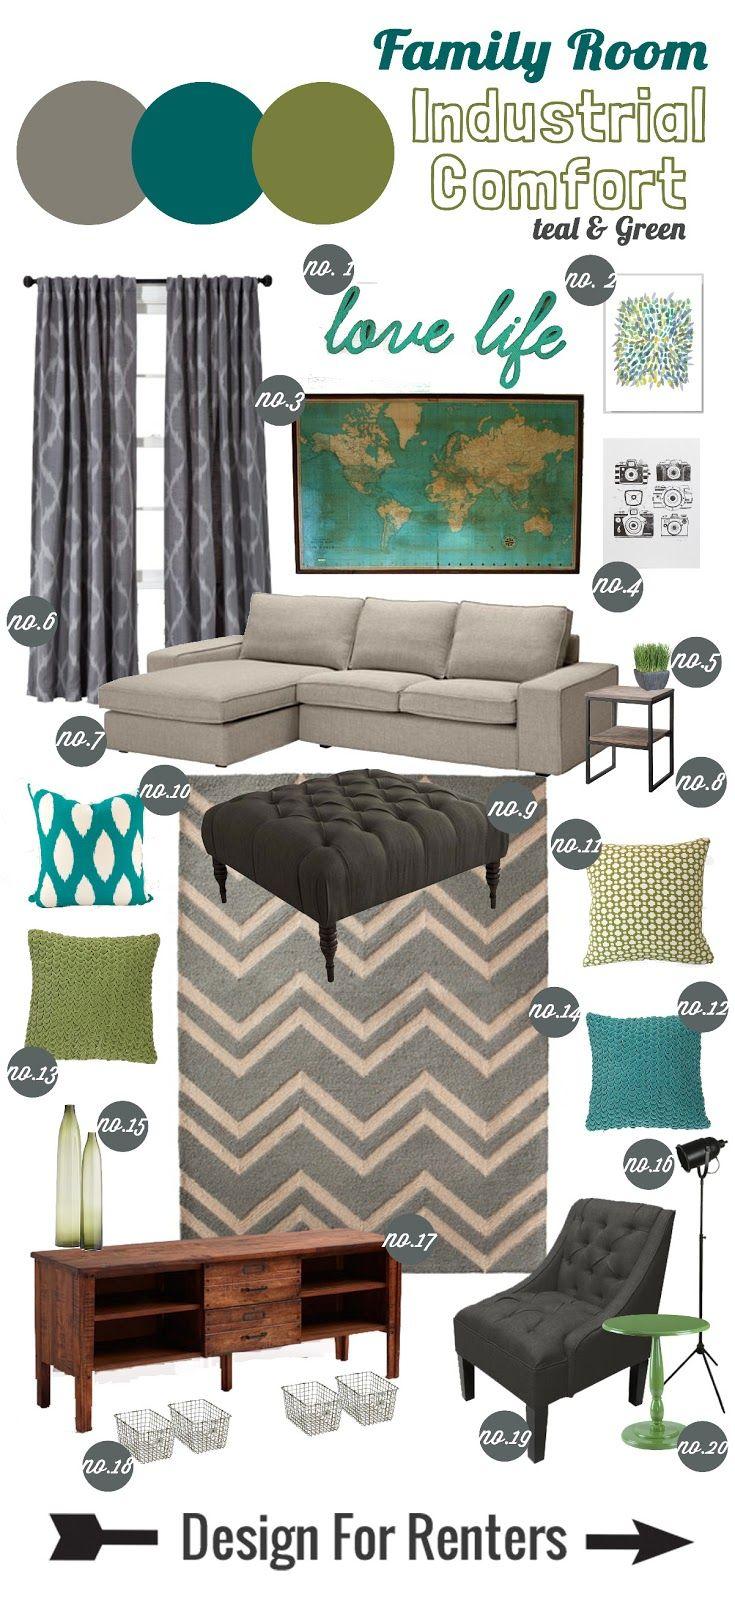 Design for Renters: Mood Board>> Industrial Comfort Family Room